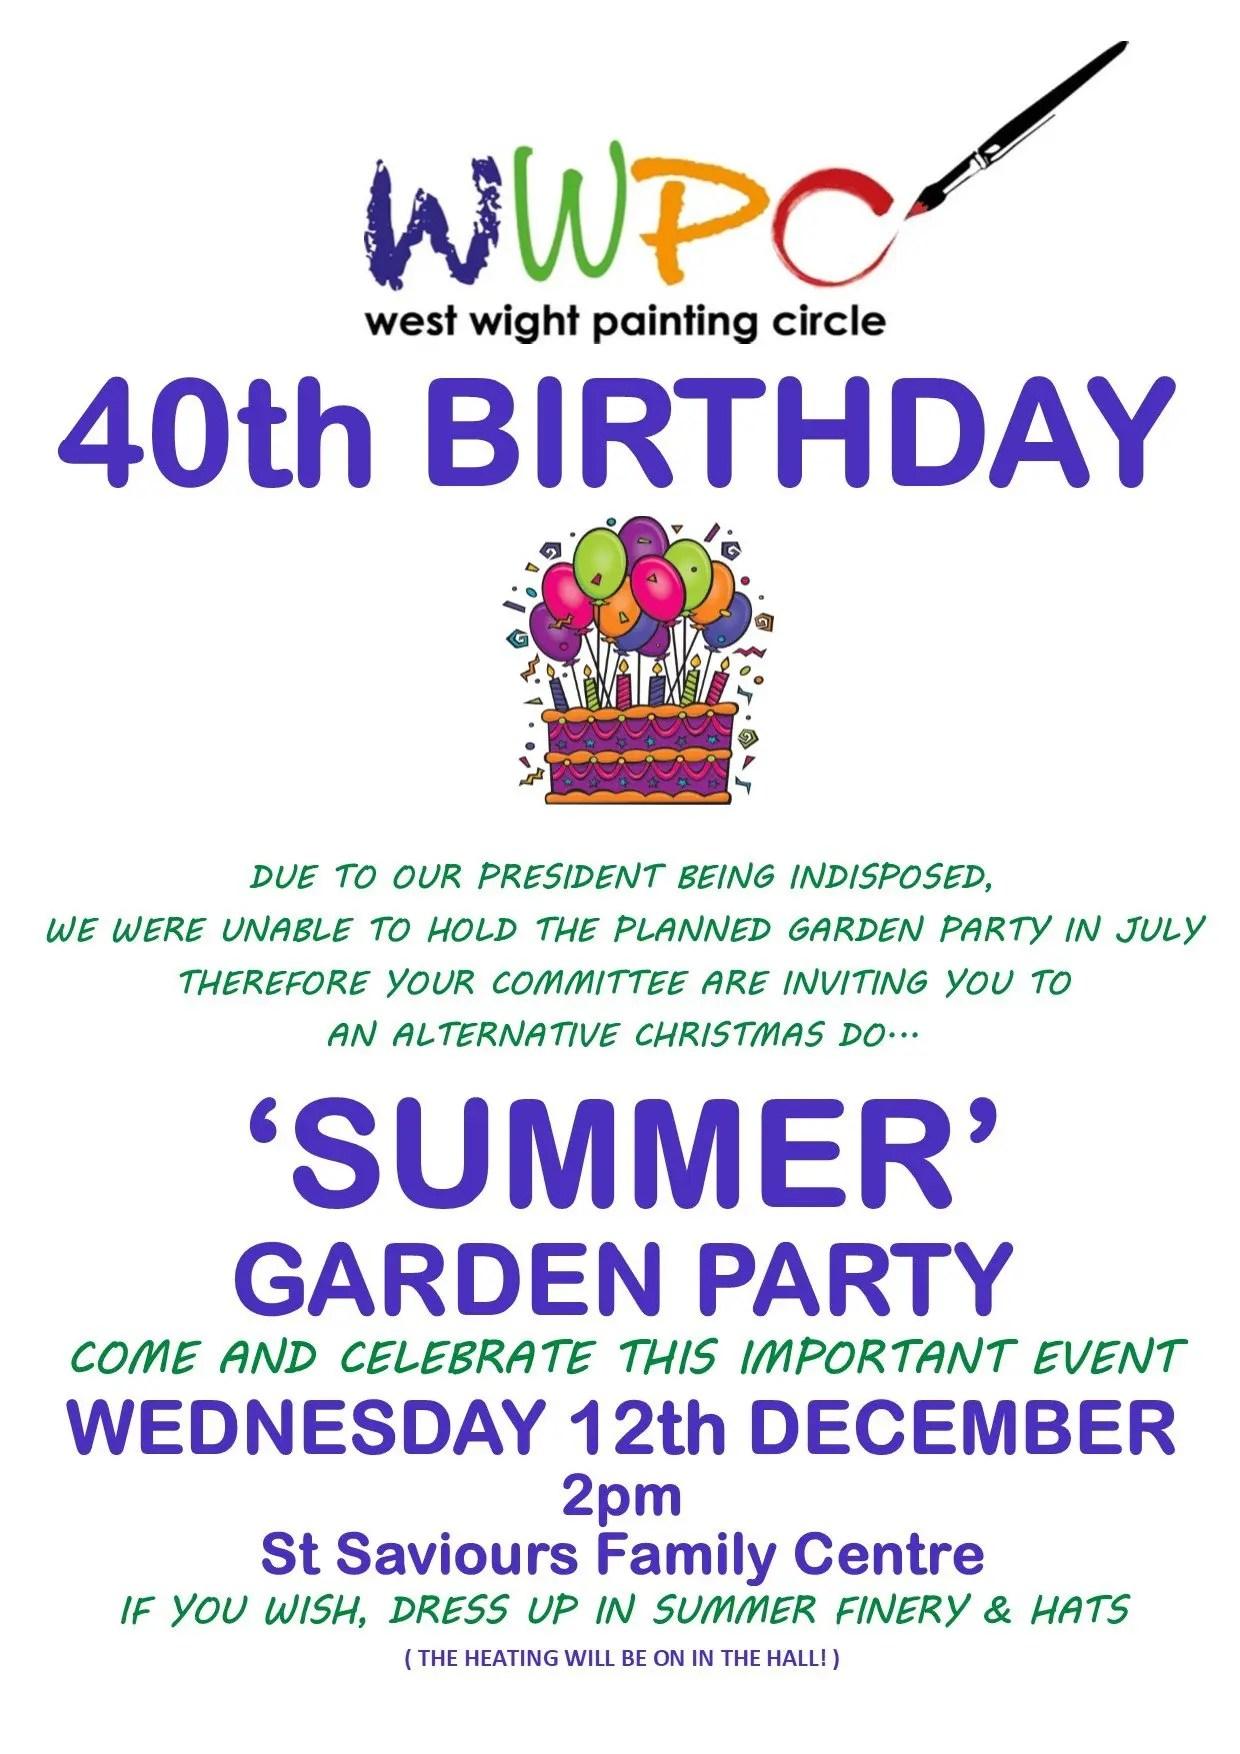 WWPC 40th Garden Party Celebrations Poster